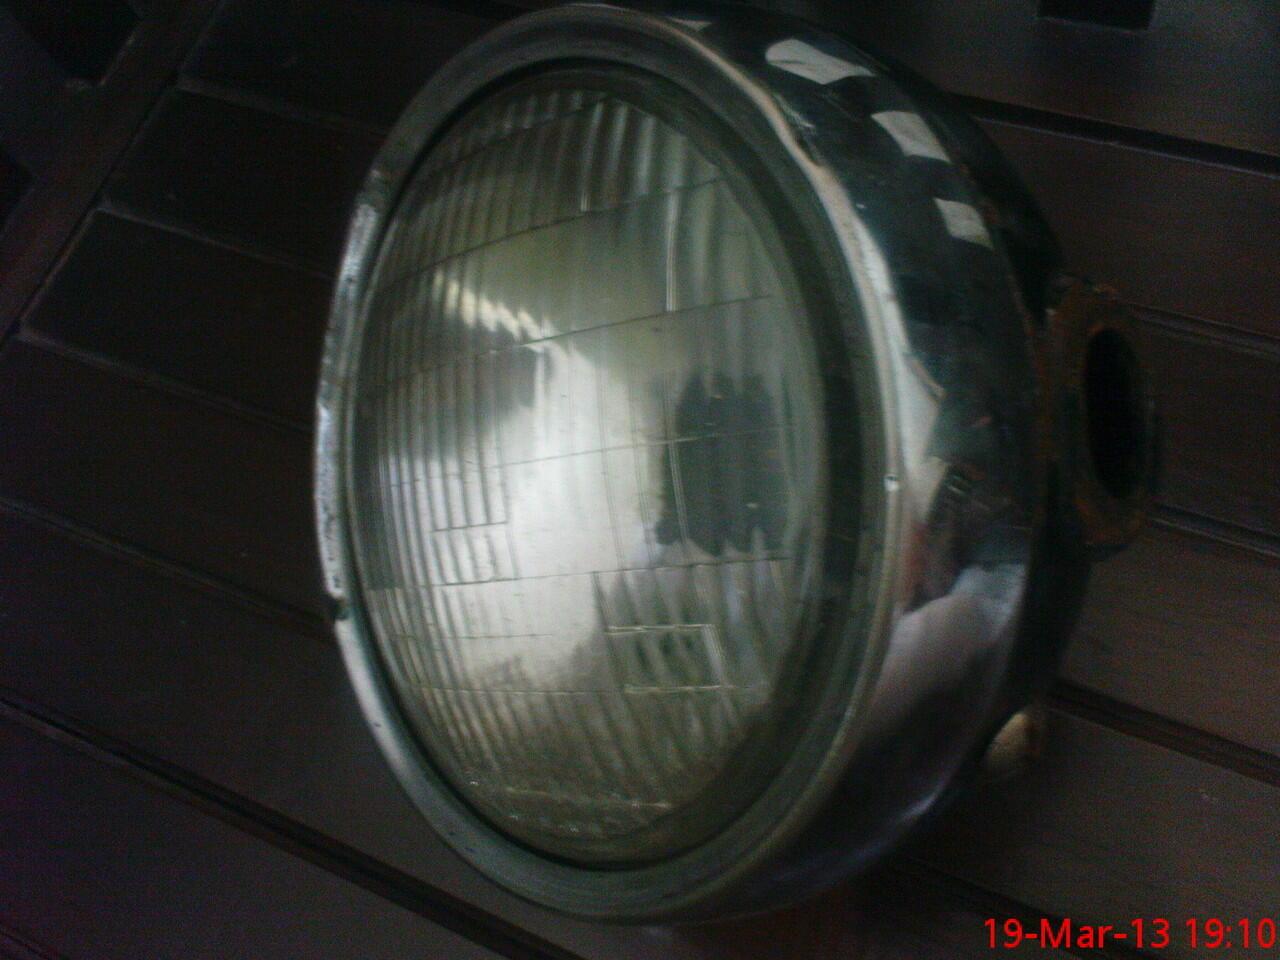 WTS: Karbu Binter MErzy CDI ori dan lampu depan bulat seken